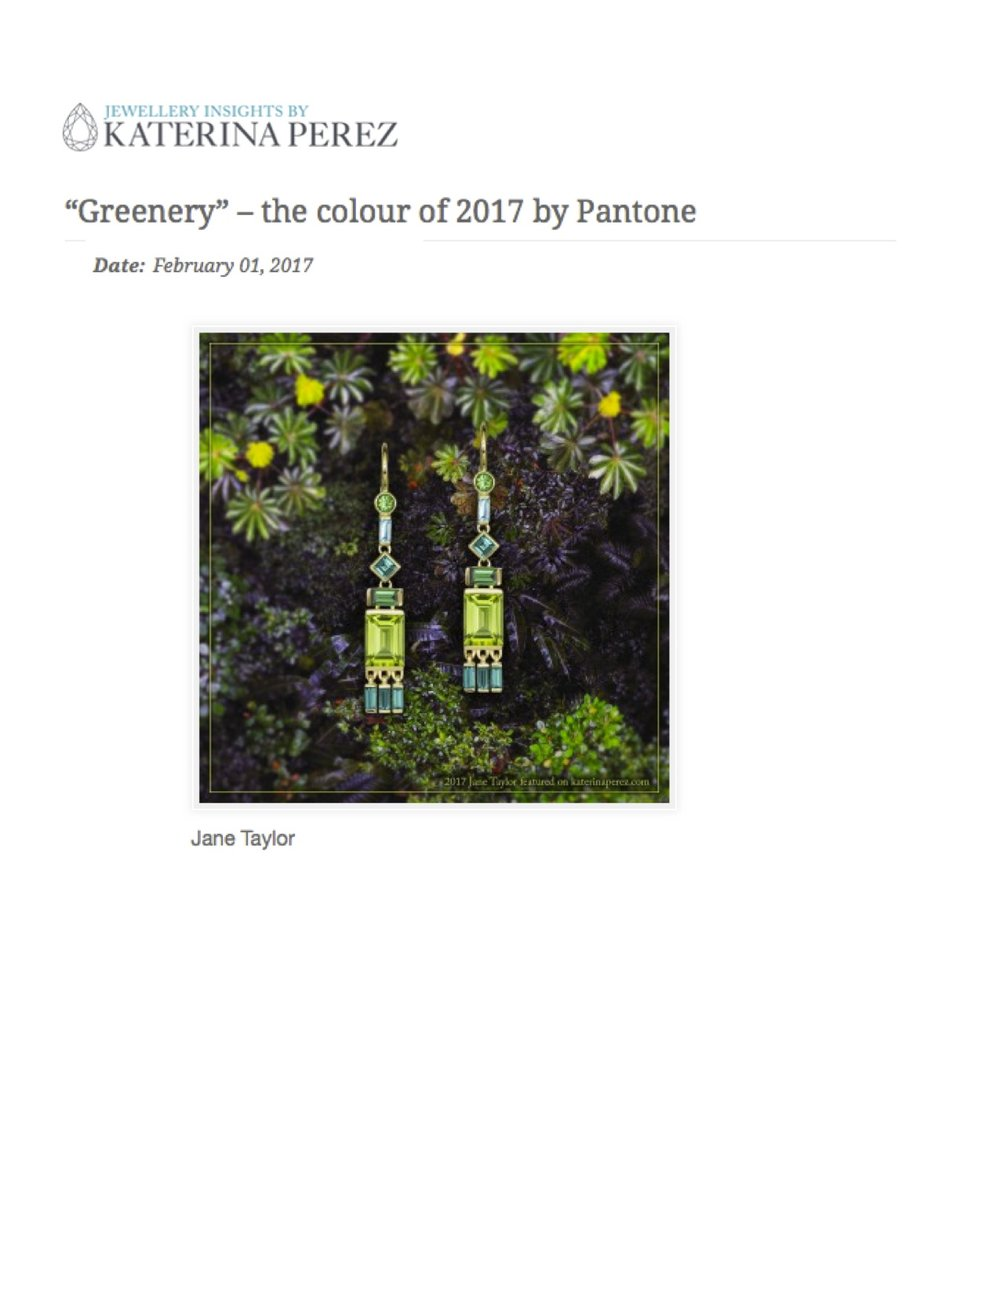 "Jane Taylor peridot tassel earrings in Katerina Perez's ""Greenery"" roundup"